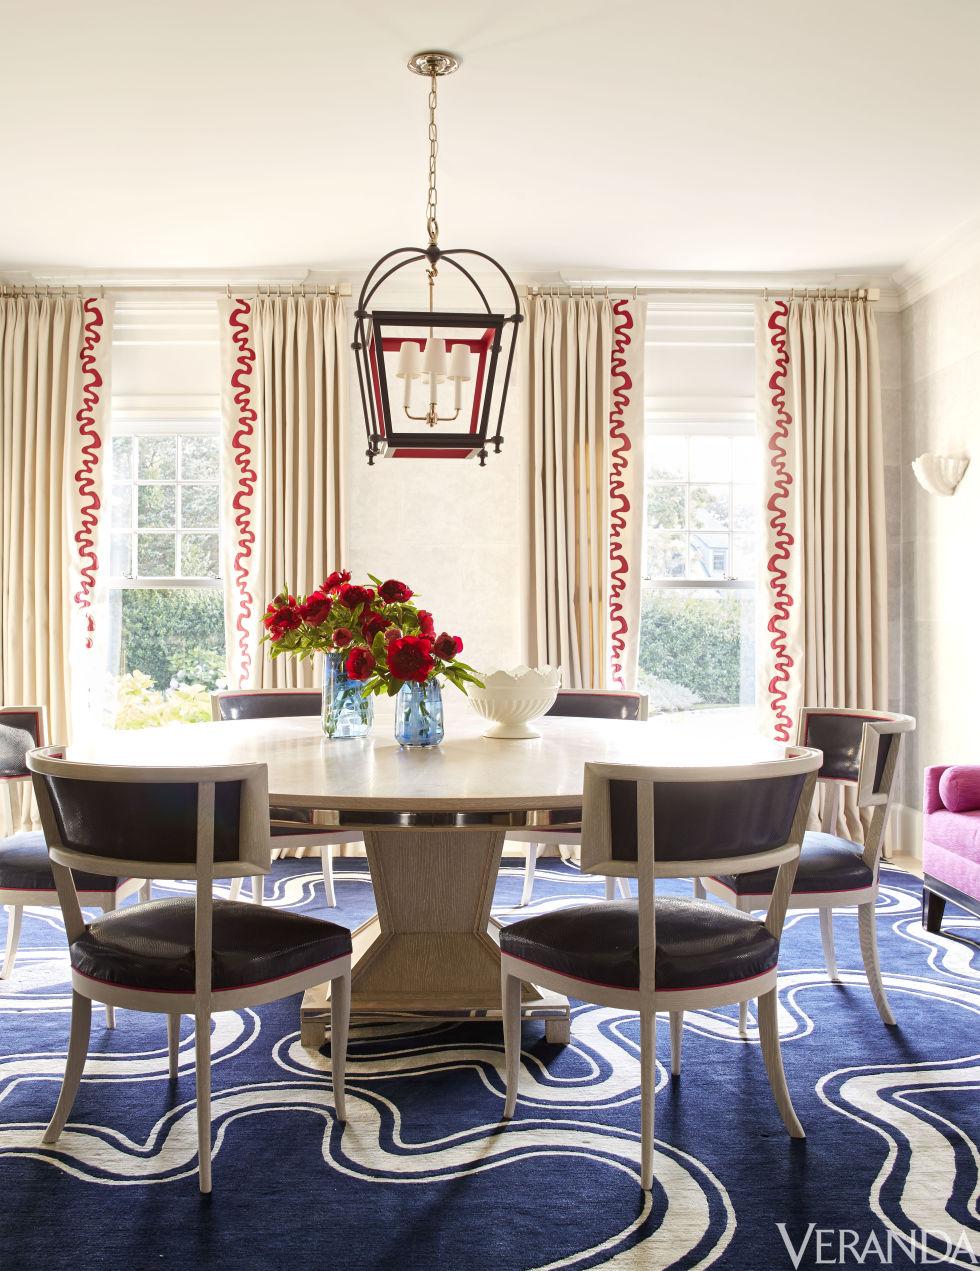 Veranda 39 s 6 best rooms with designer rugs in august 2016 - Veranda dining rooms ...